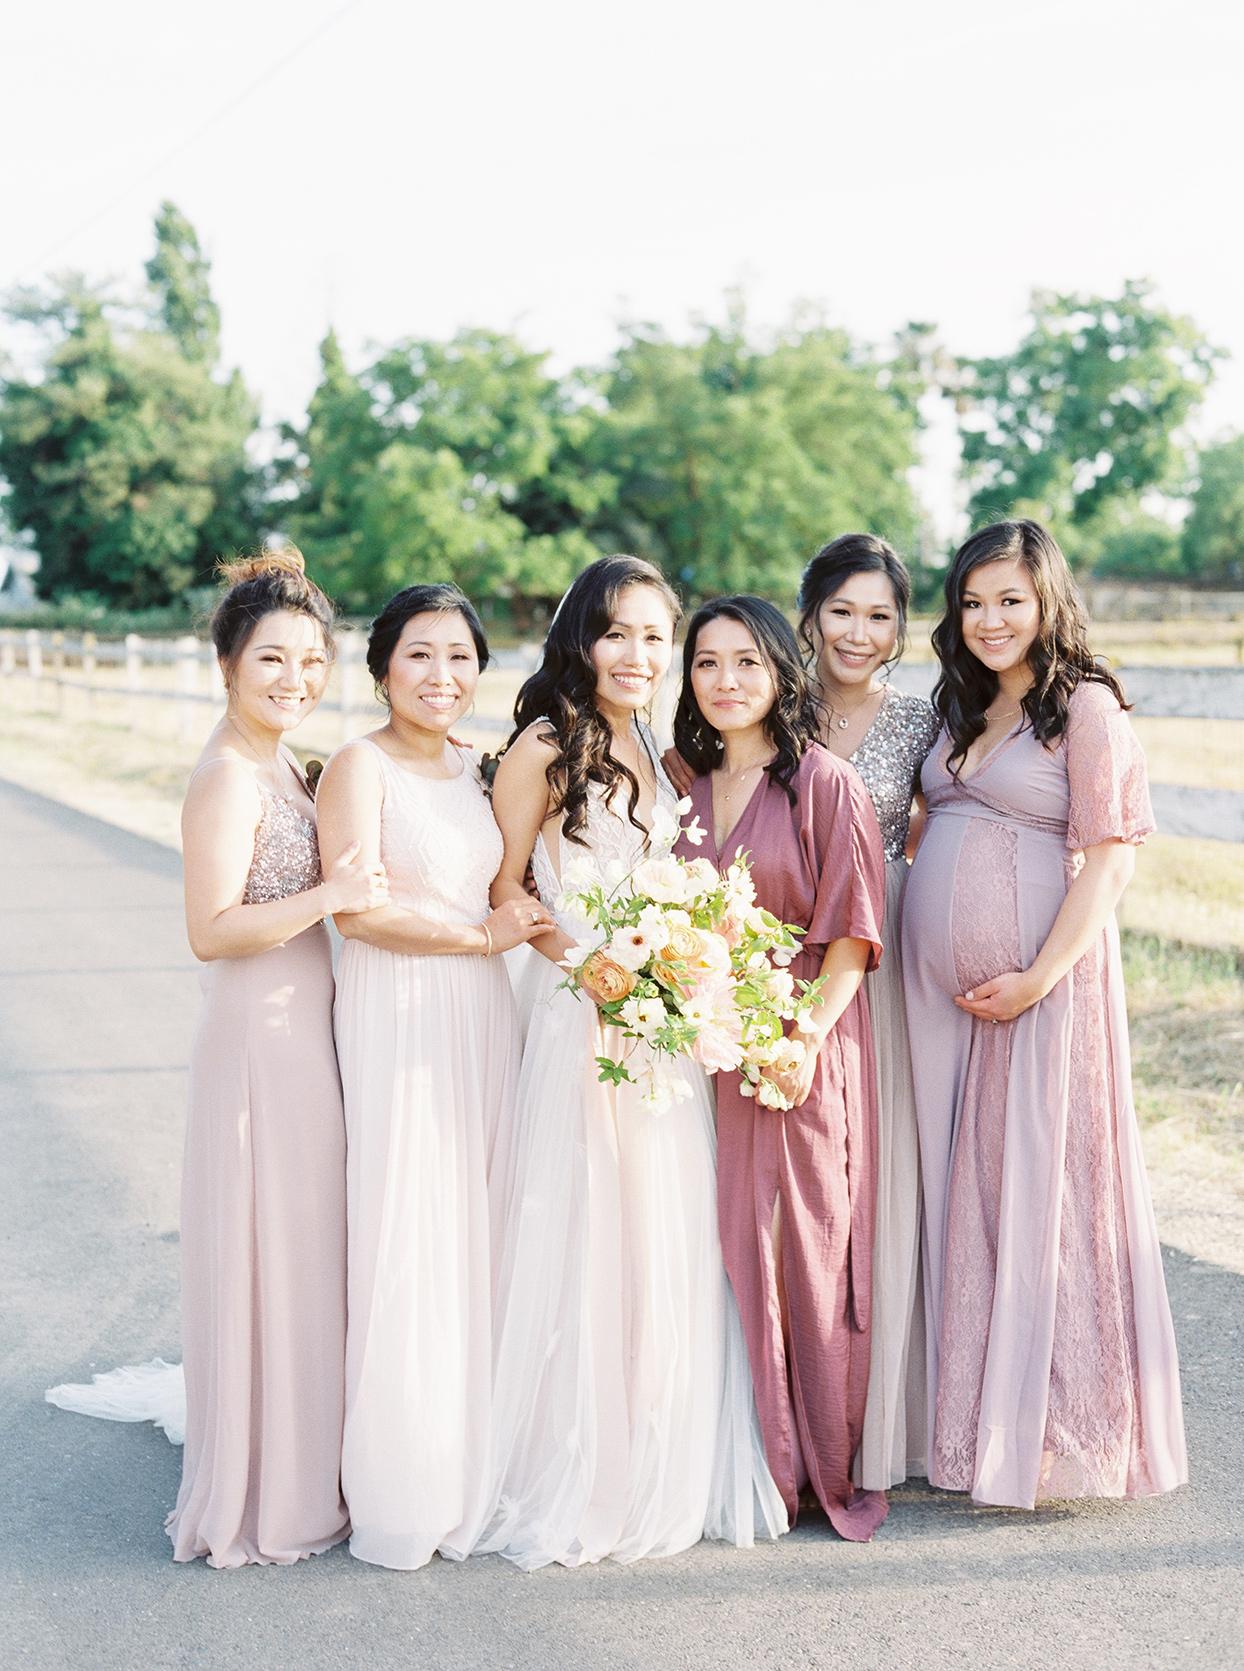 thuy kahn wedding friends in shades of lavender